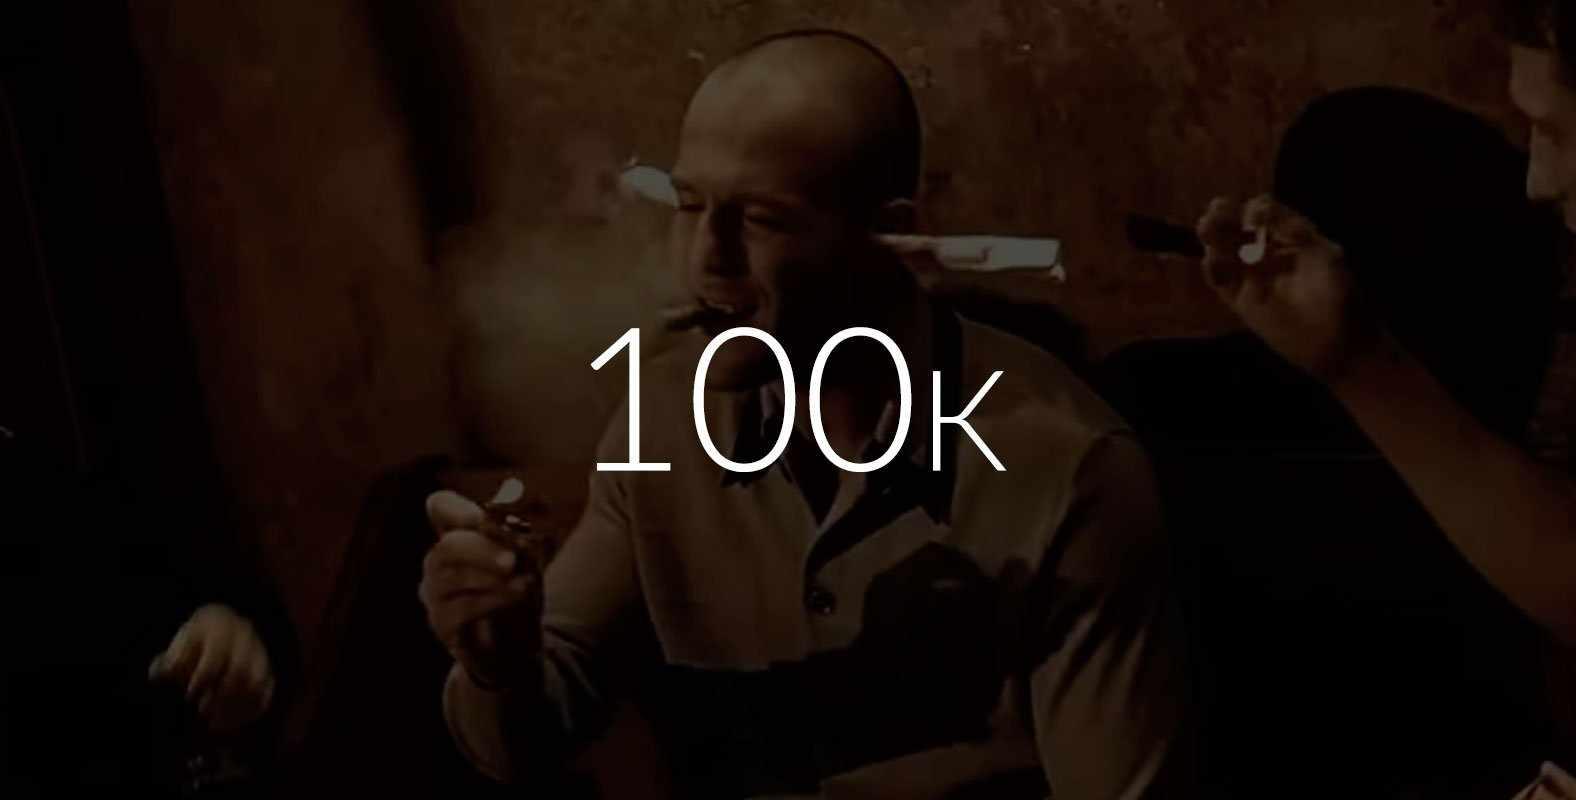 Как заработать 100 000 рублей за месяц на фрилансе